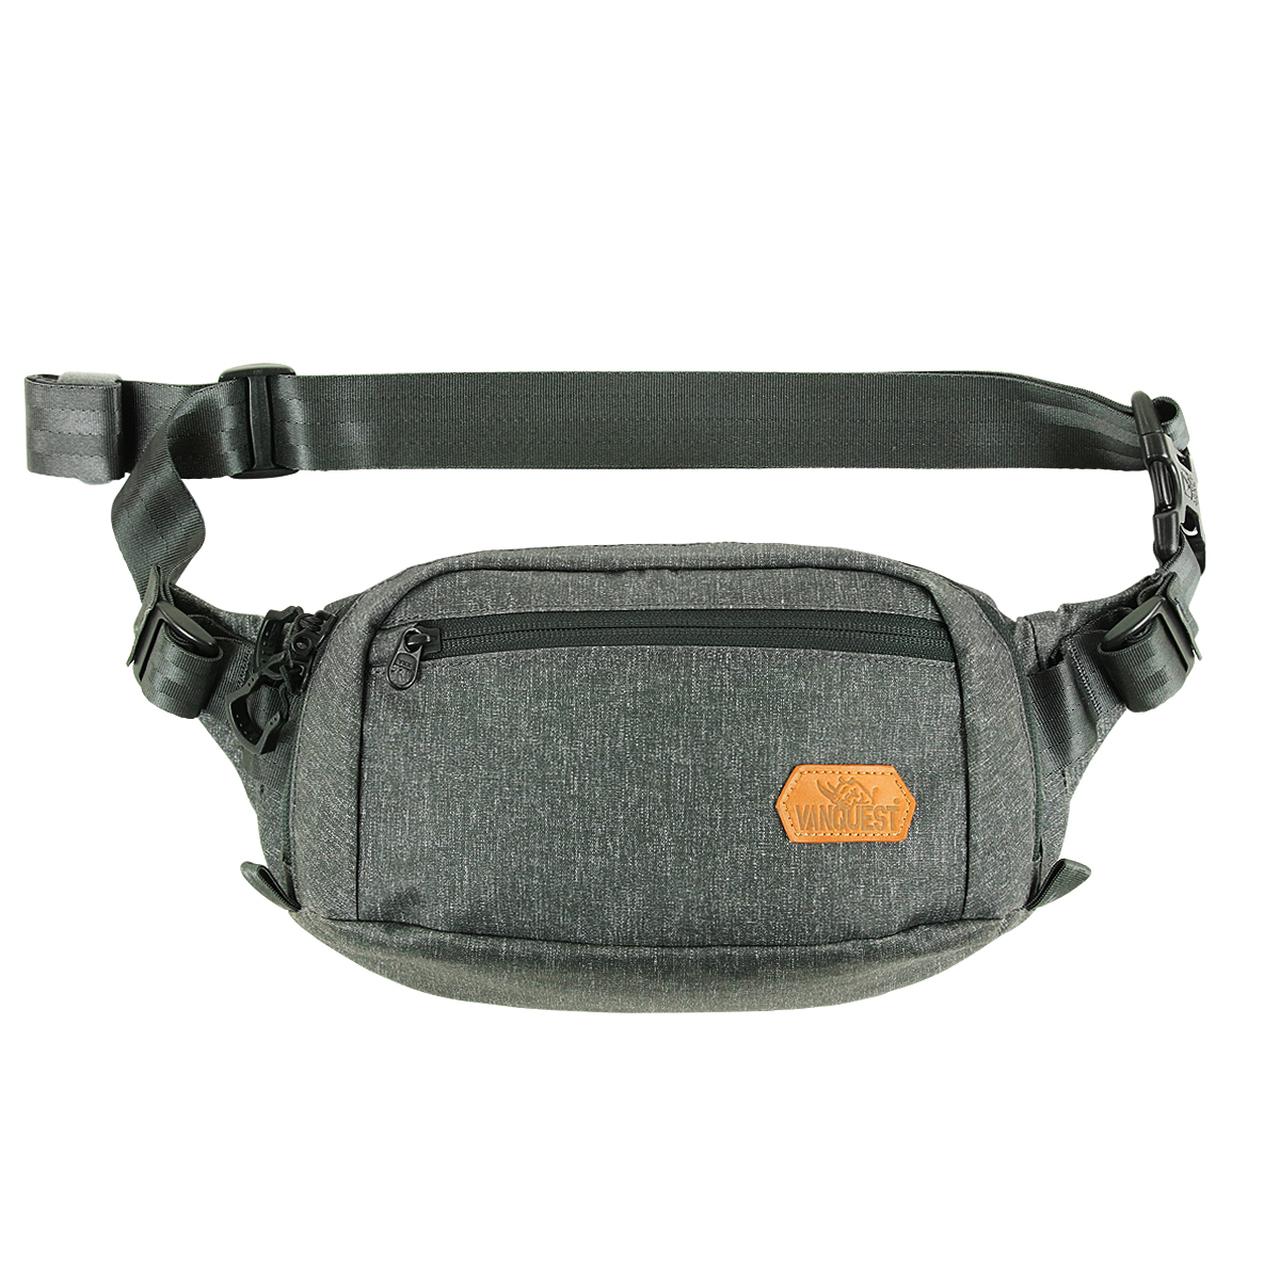 DENDRITE-LARGE Waist Pack - Schattengrau